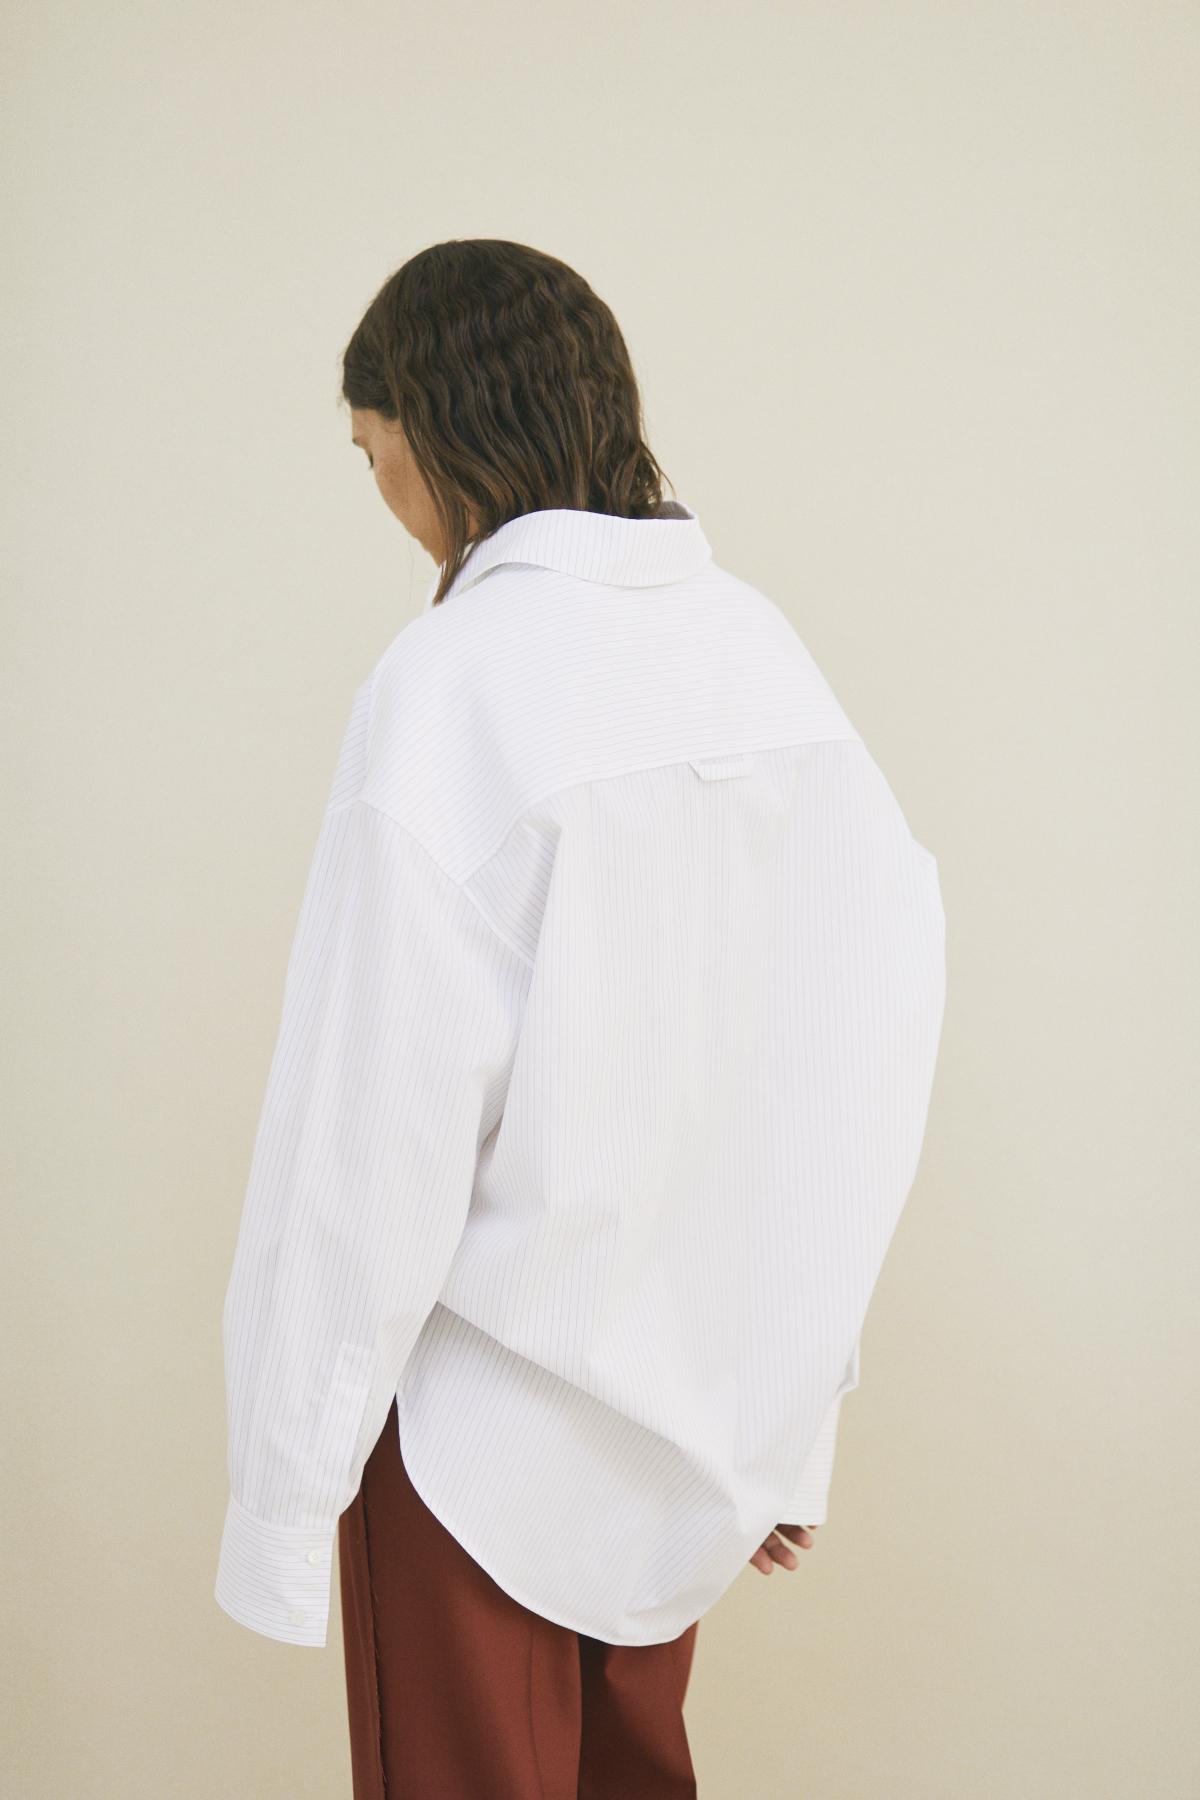 Shirt SYLVIE, Trousers SOLENNE